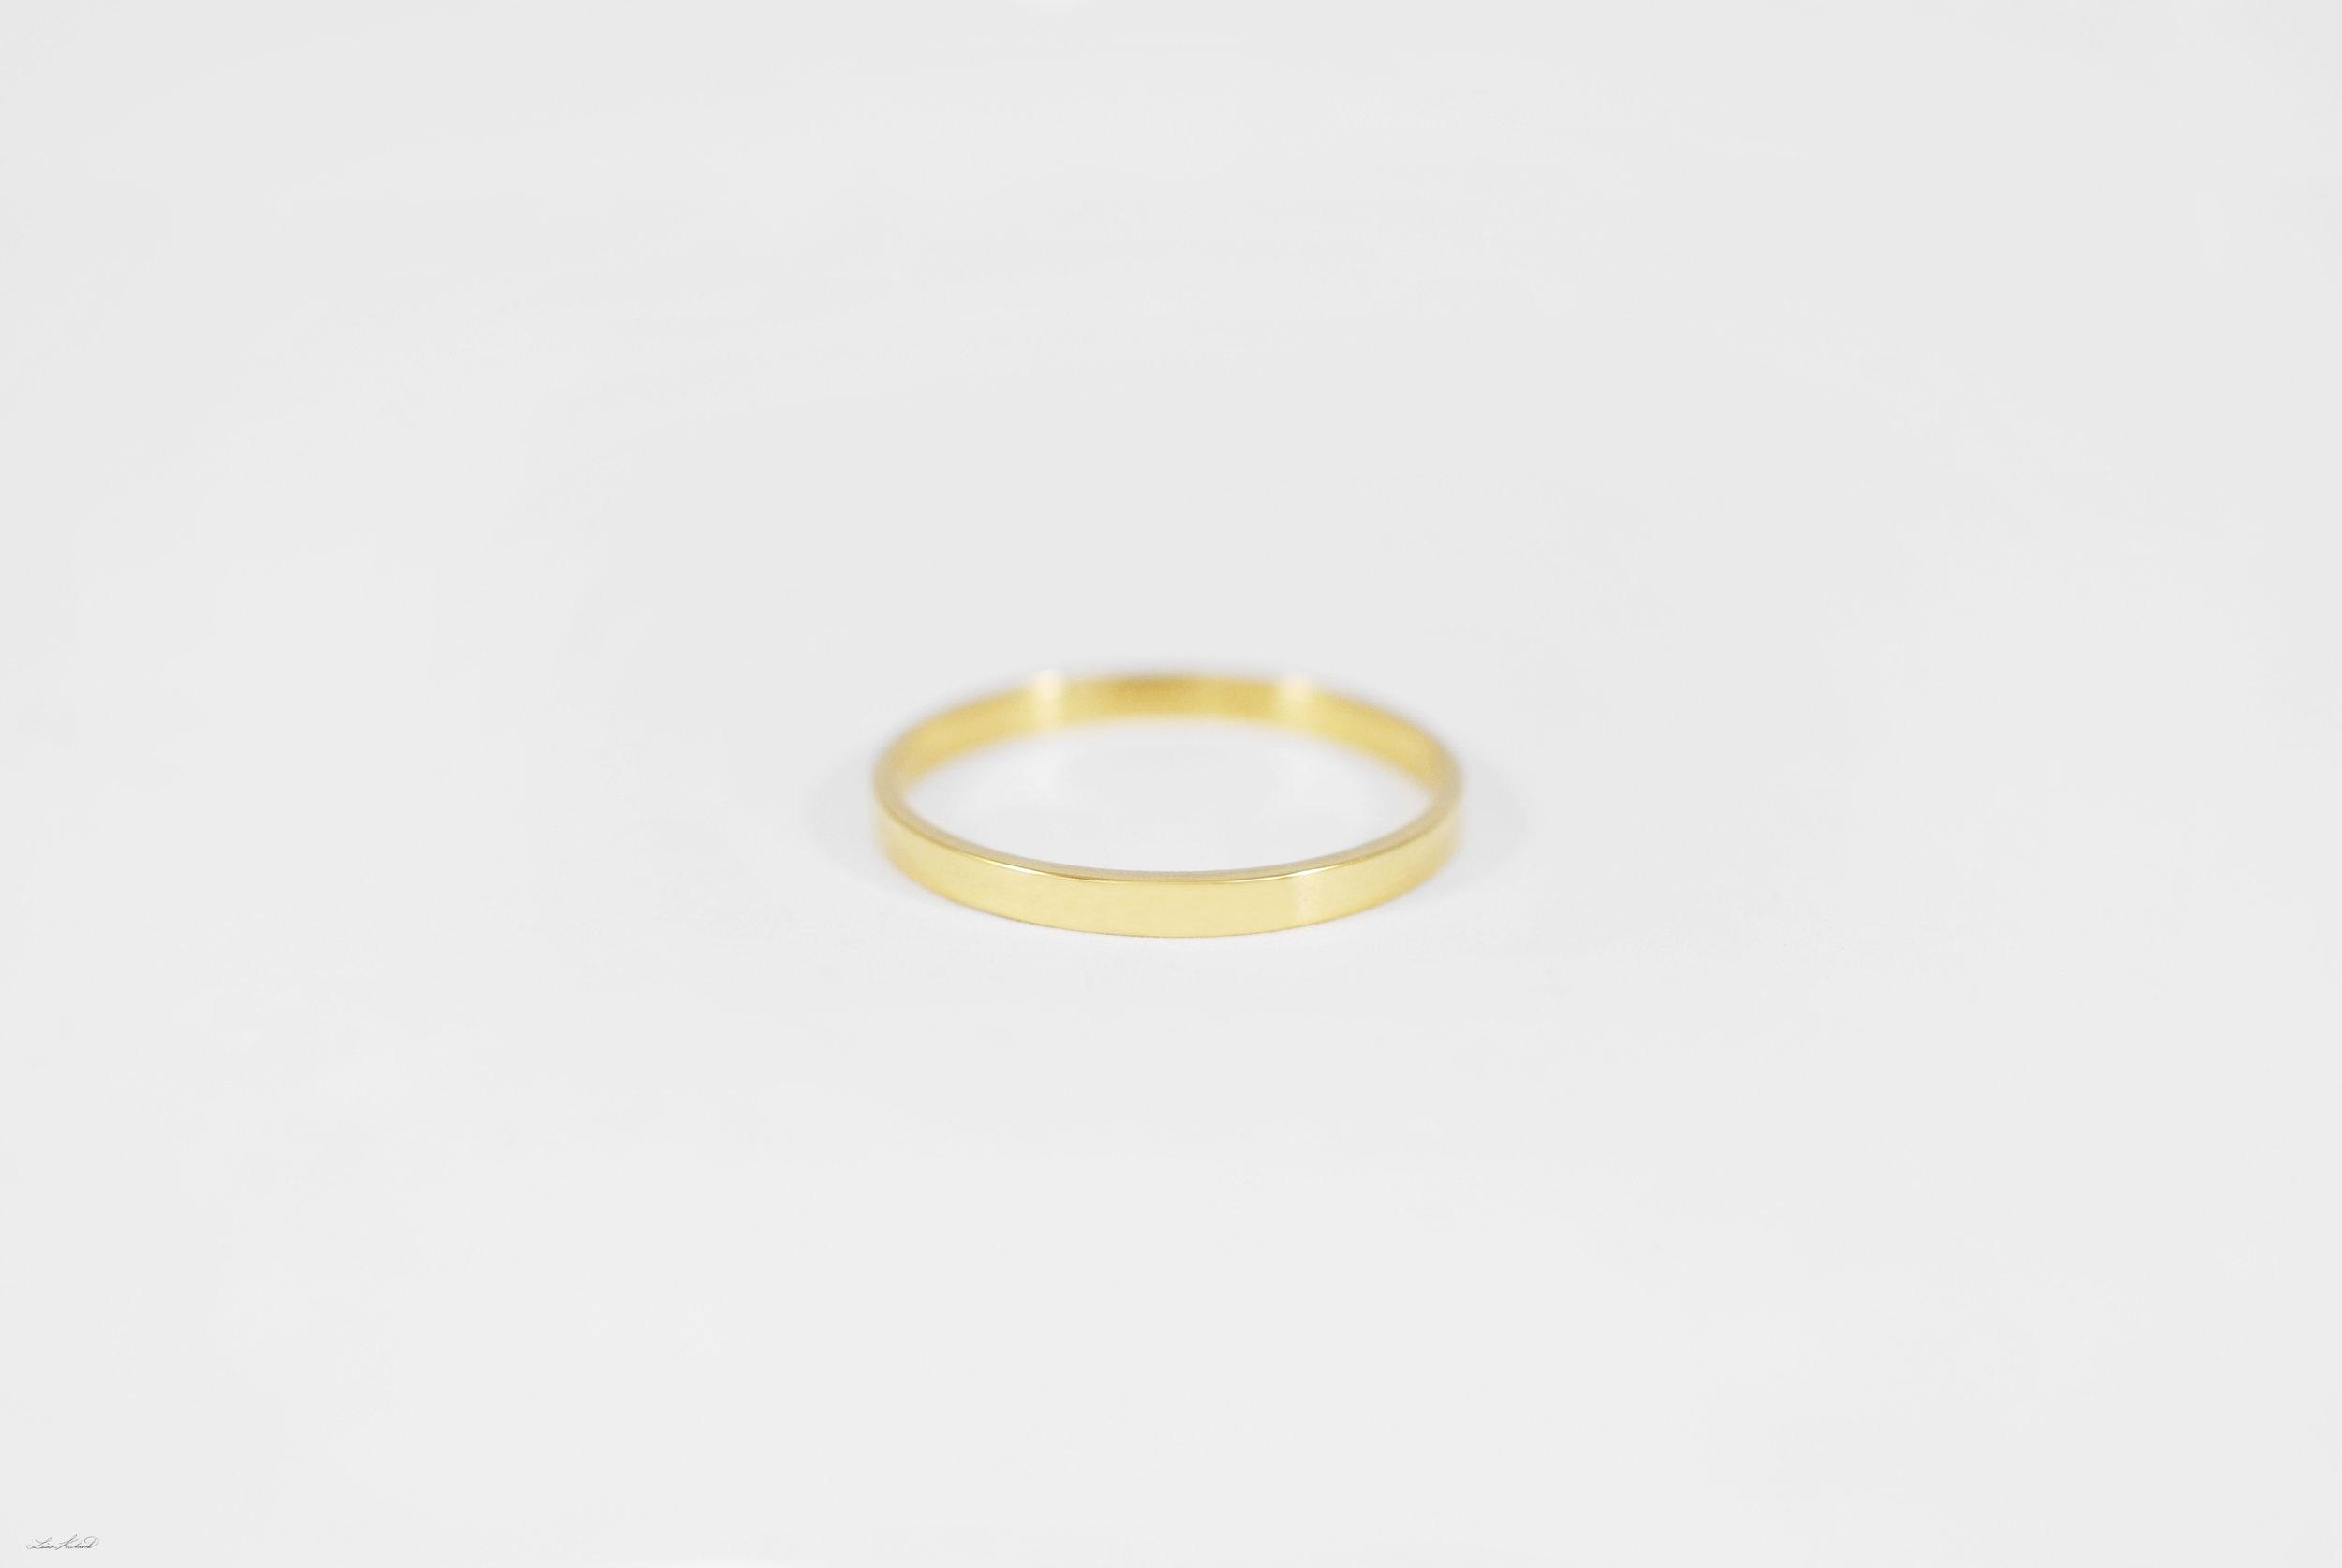 gold rect. ring.jpg